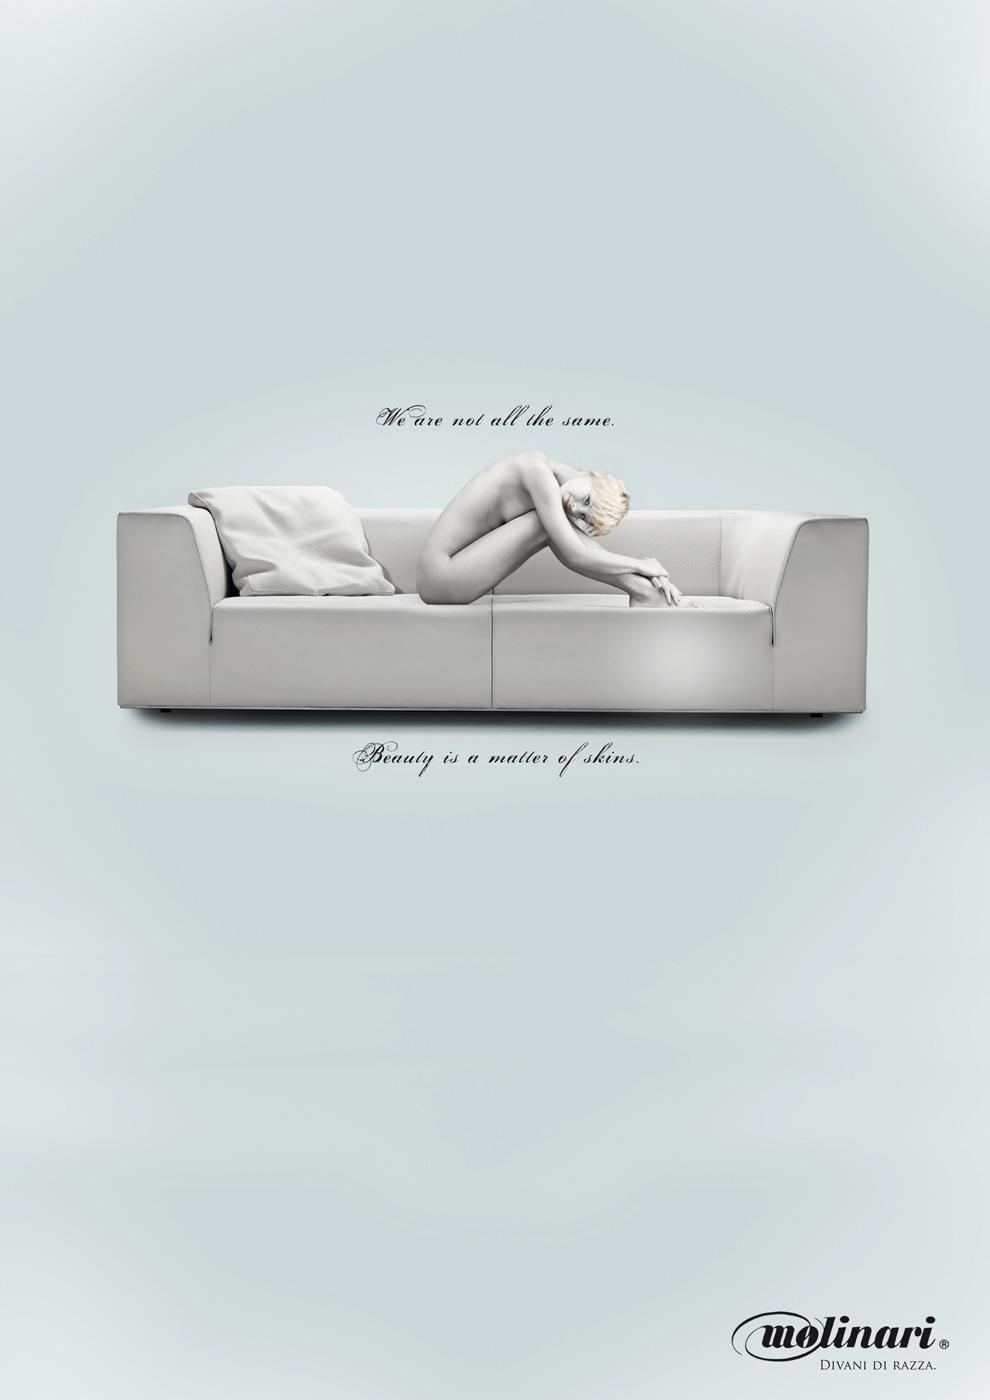 Molinari Print Ad -  Beauty